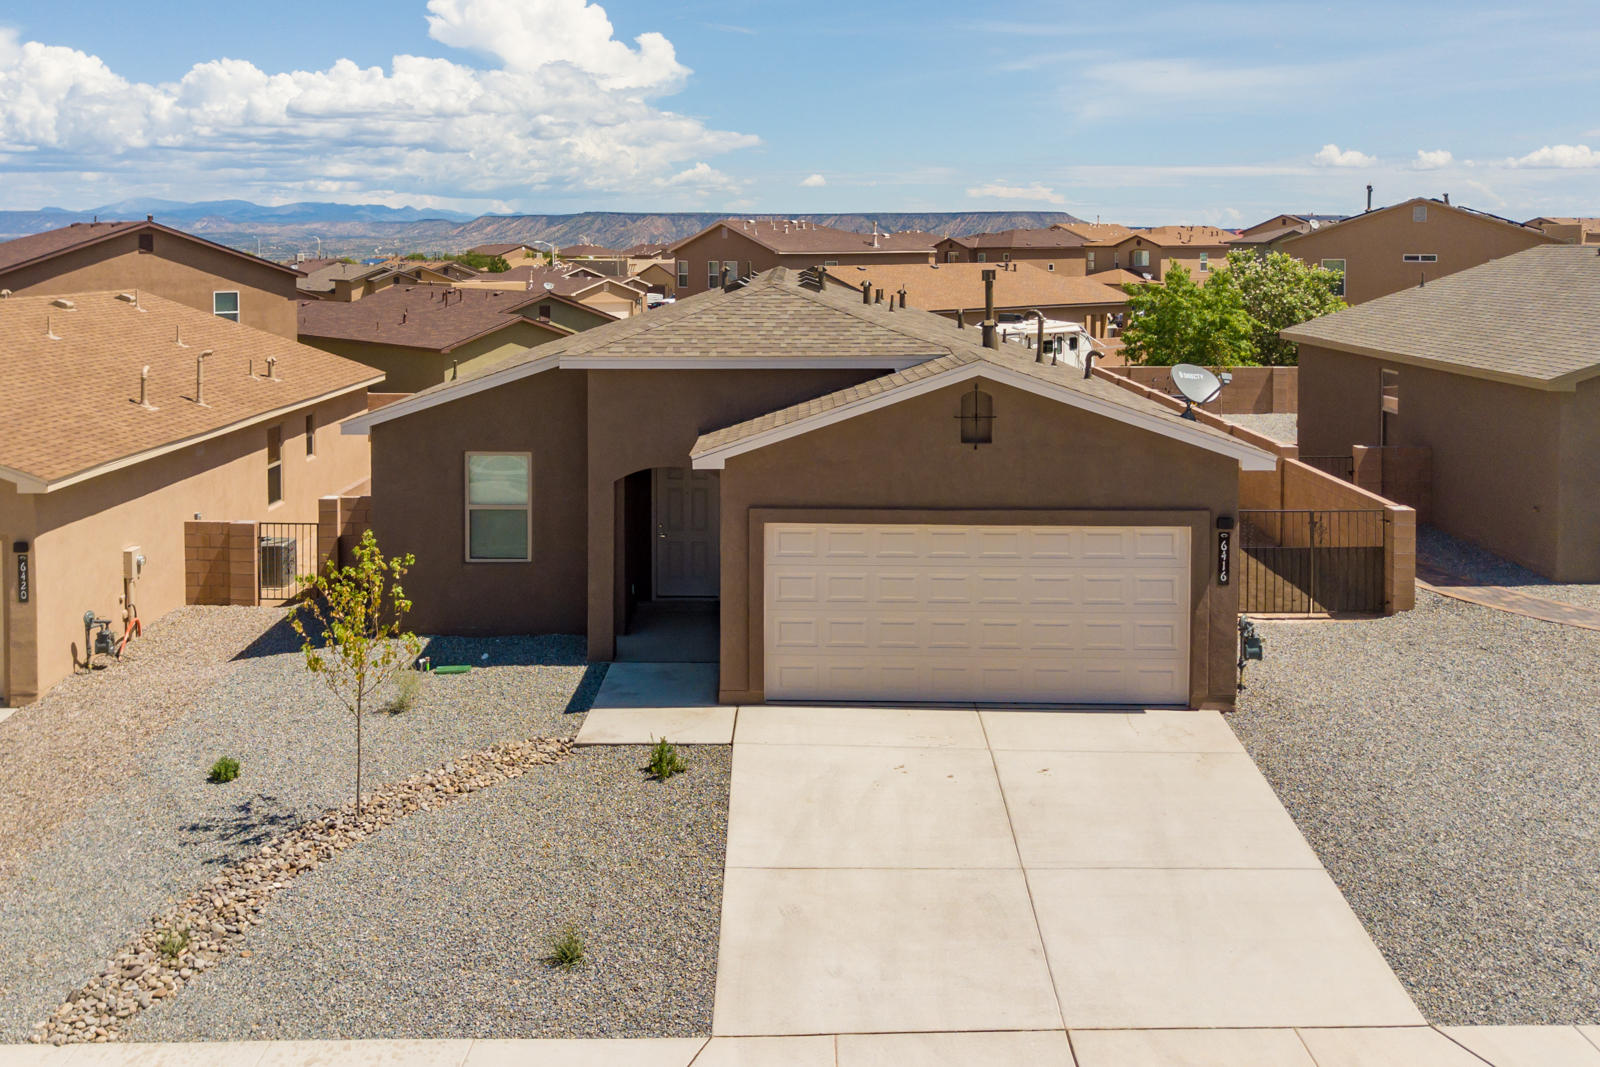 509 TYRACK Lane SW Property Photo - Albuquerque, NM real estate listing